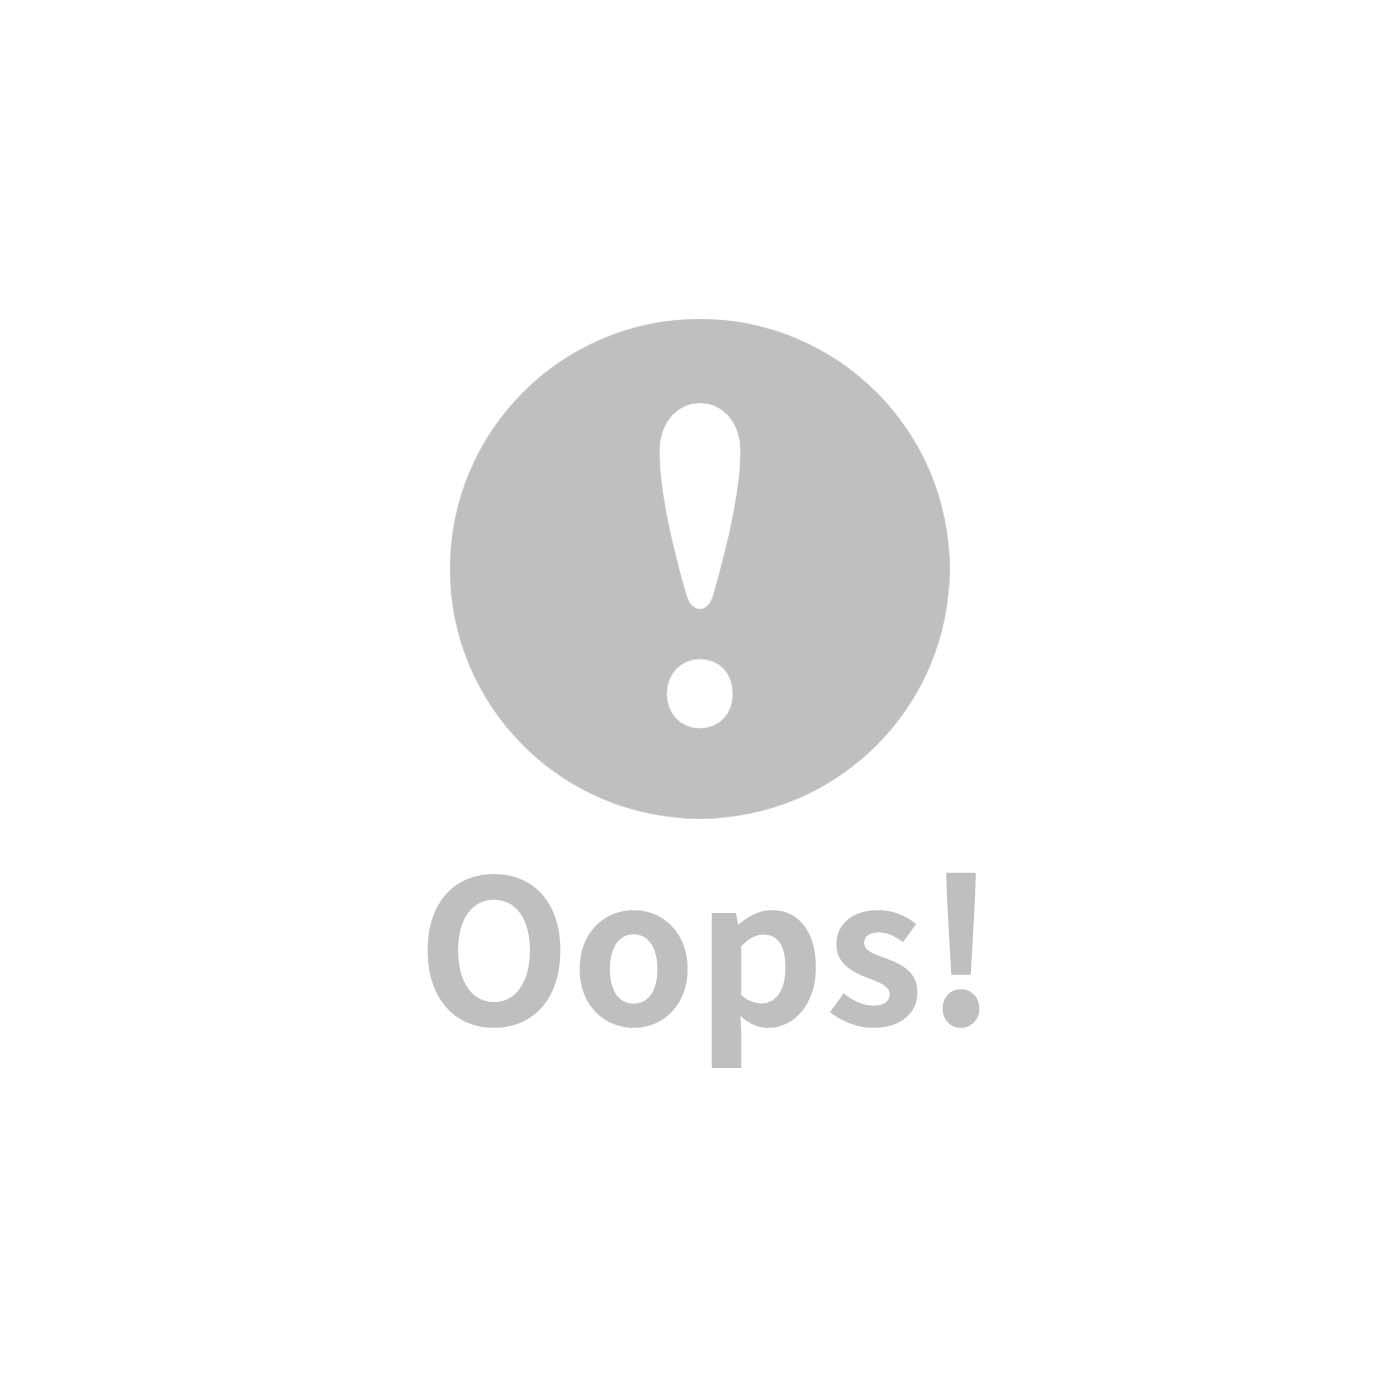 Kinderspel寶寶保暖柔軟圍巾(橘粉菱格)